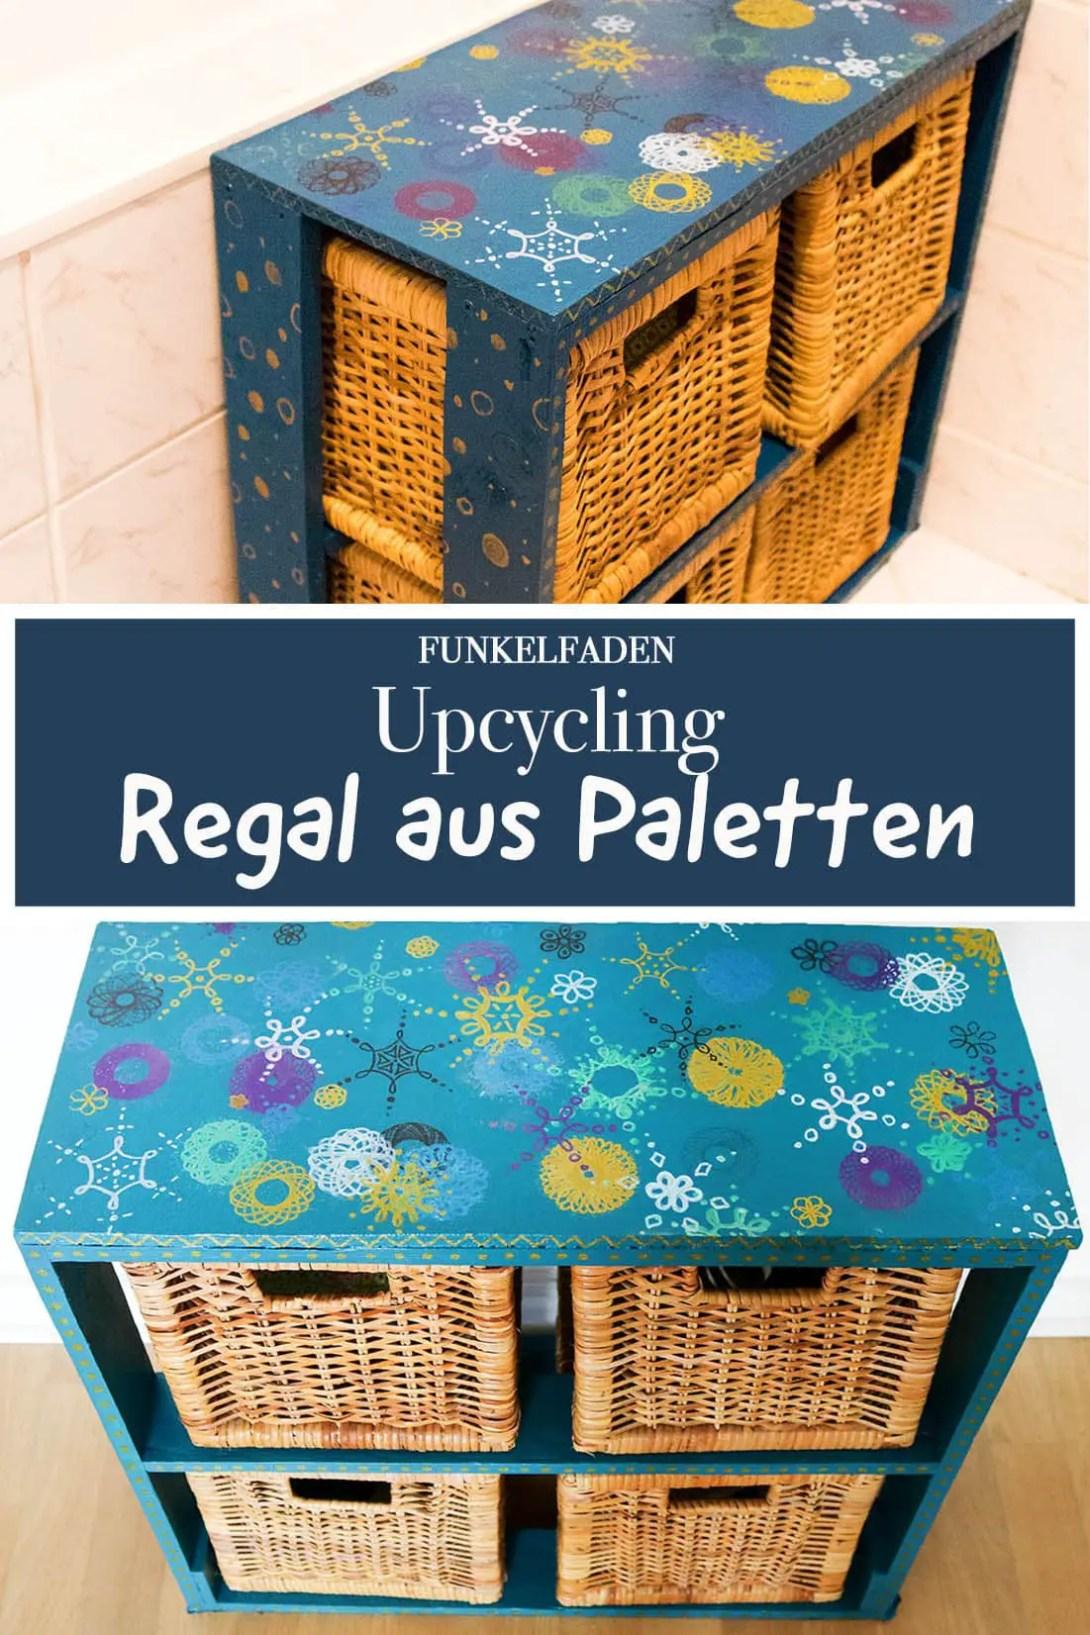 Upcycling Regal aus Paletten